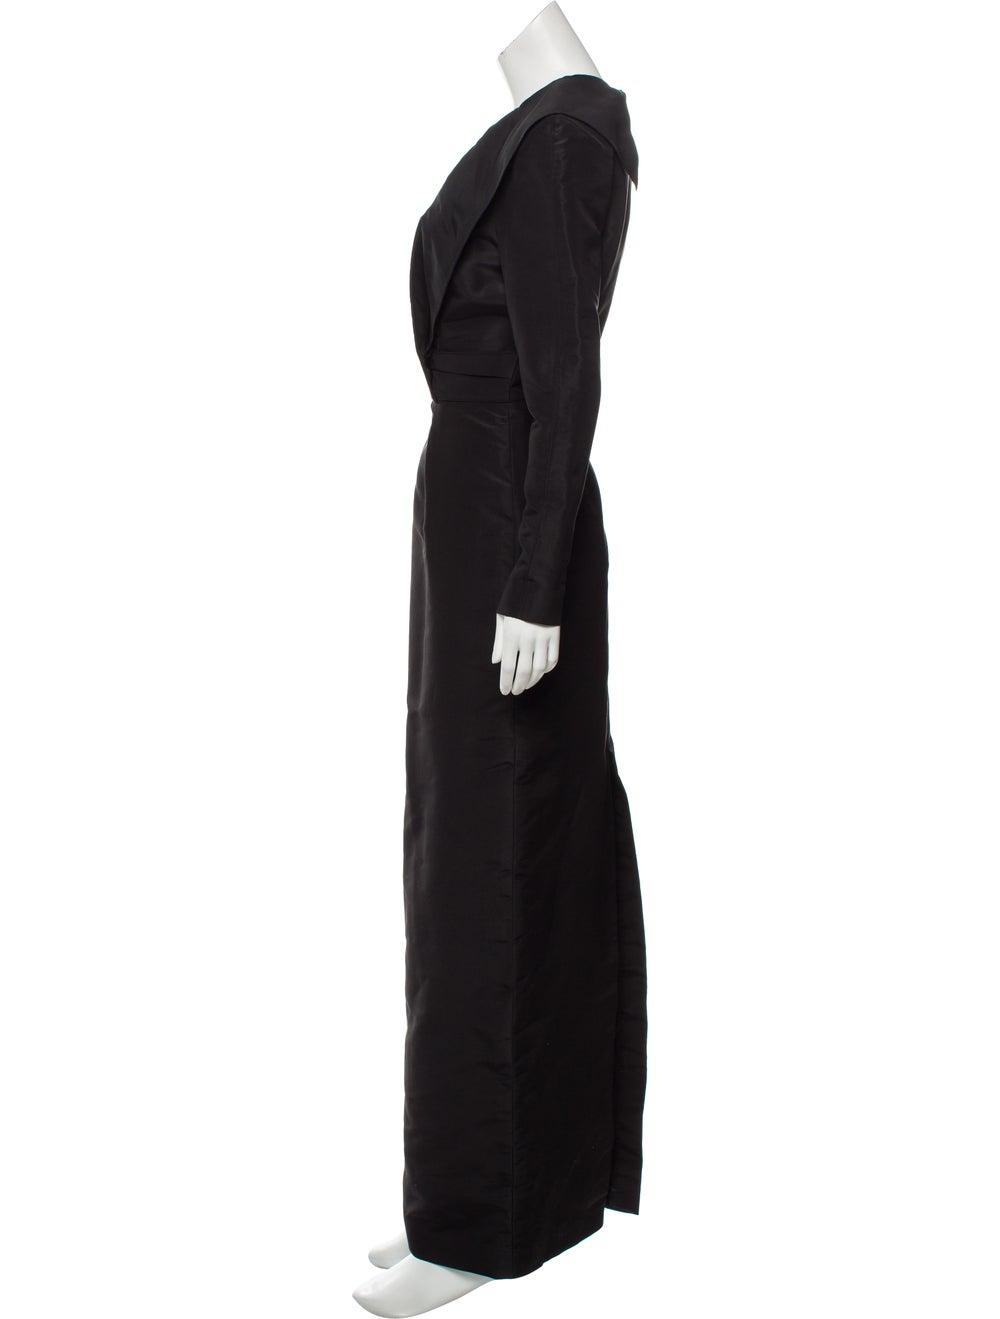 Oscar de la Renta Silk Maxi Dress Black - image 2